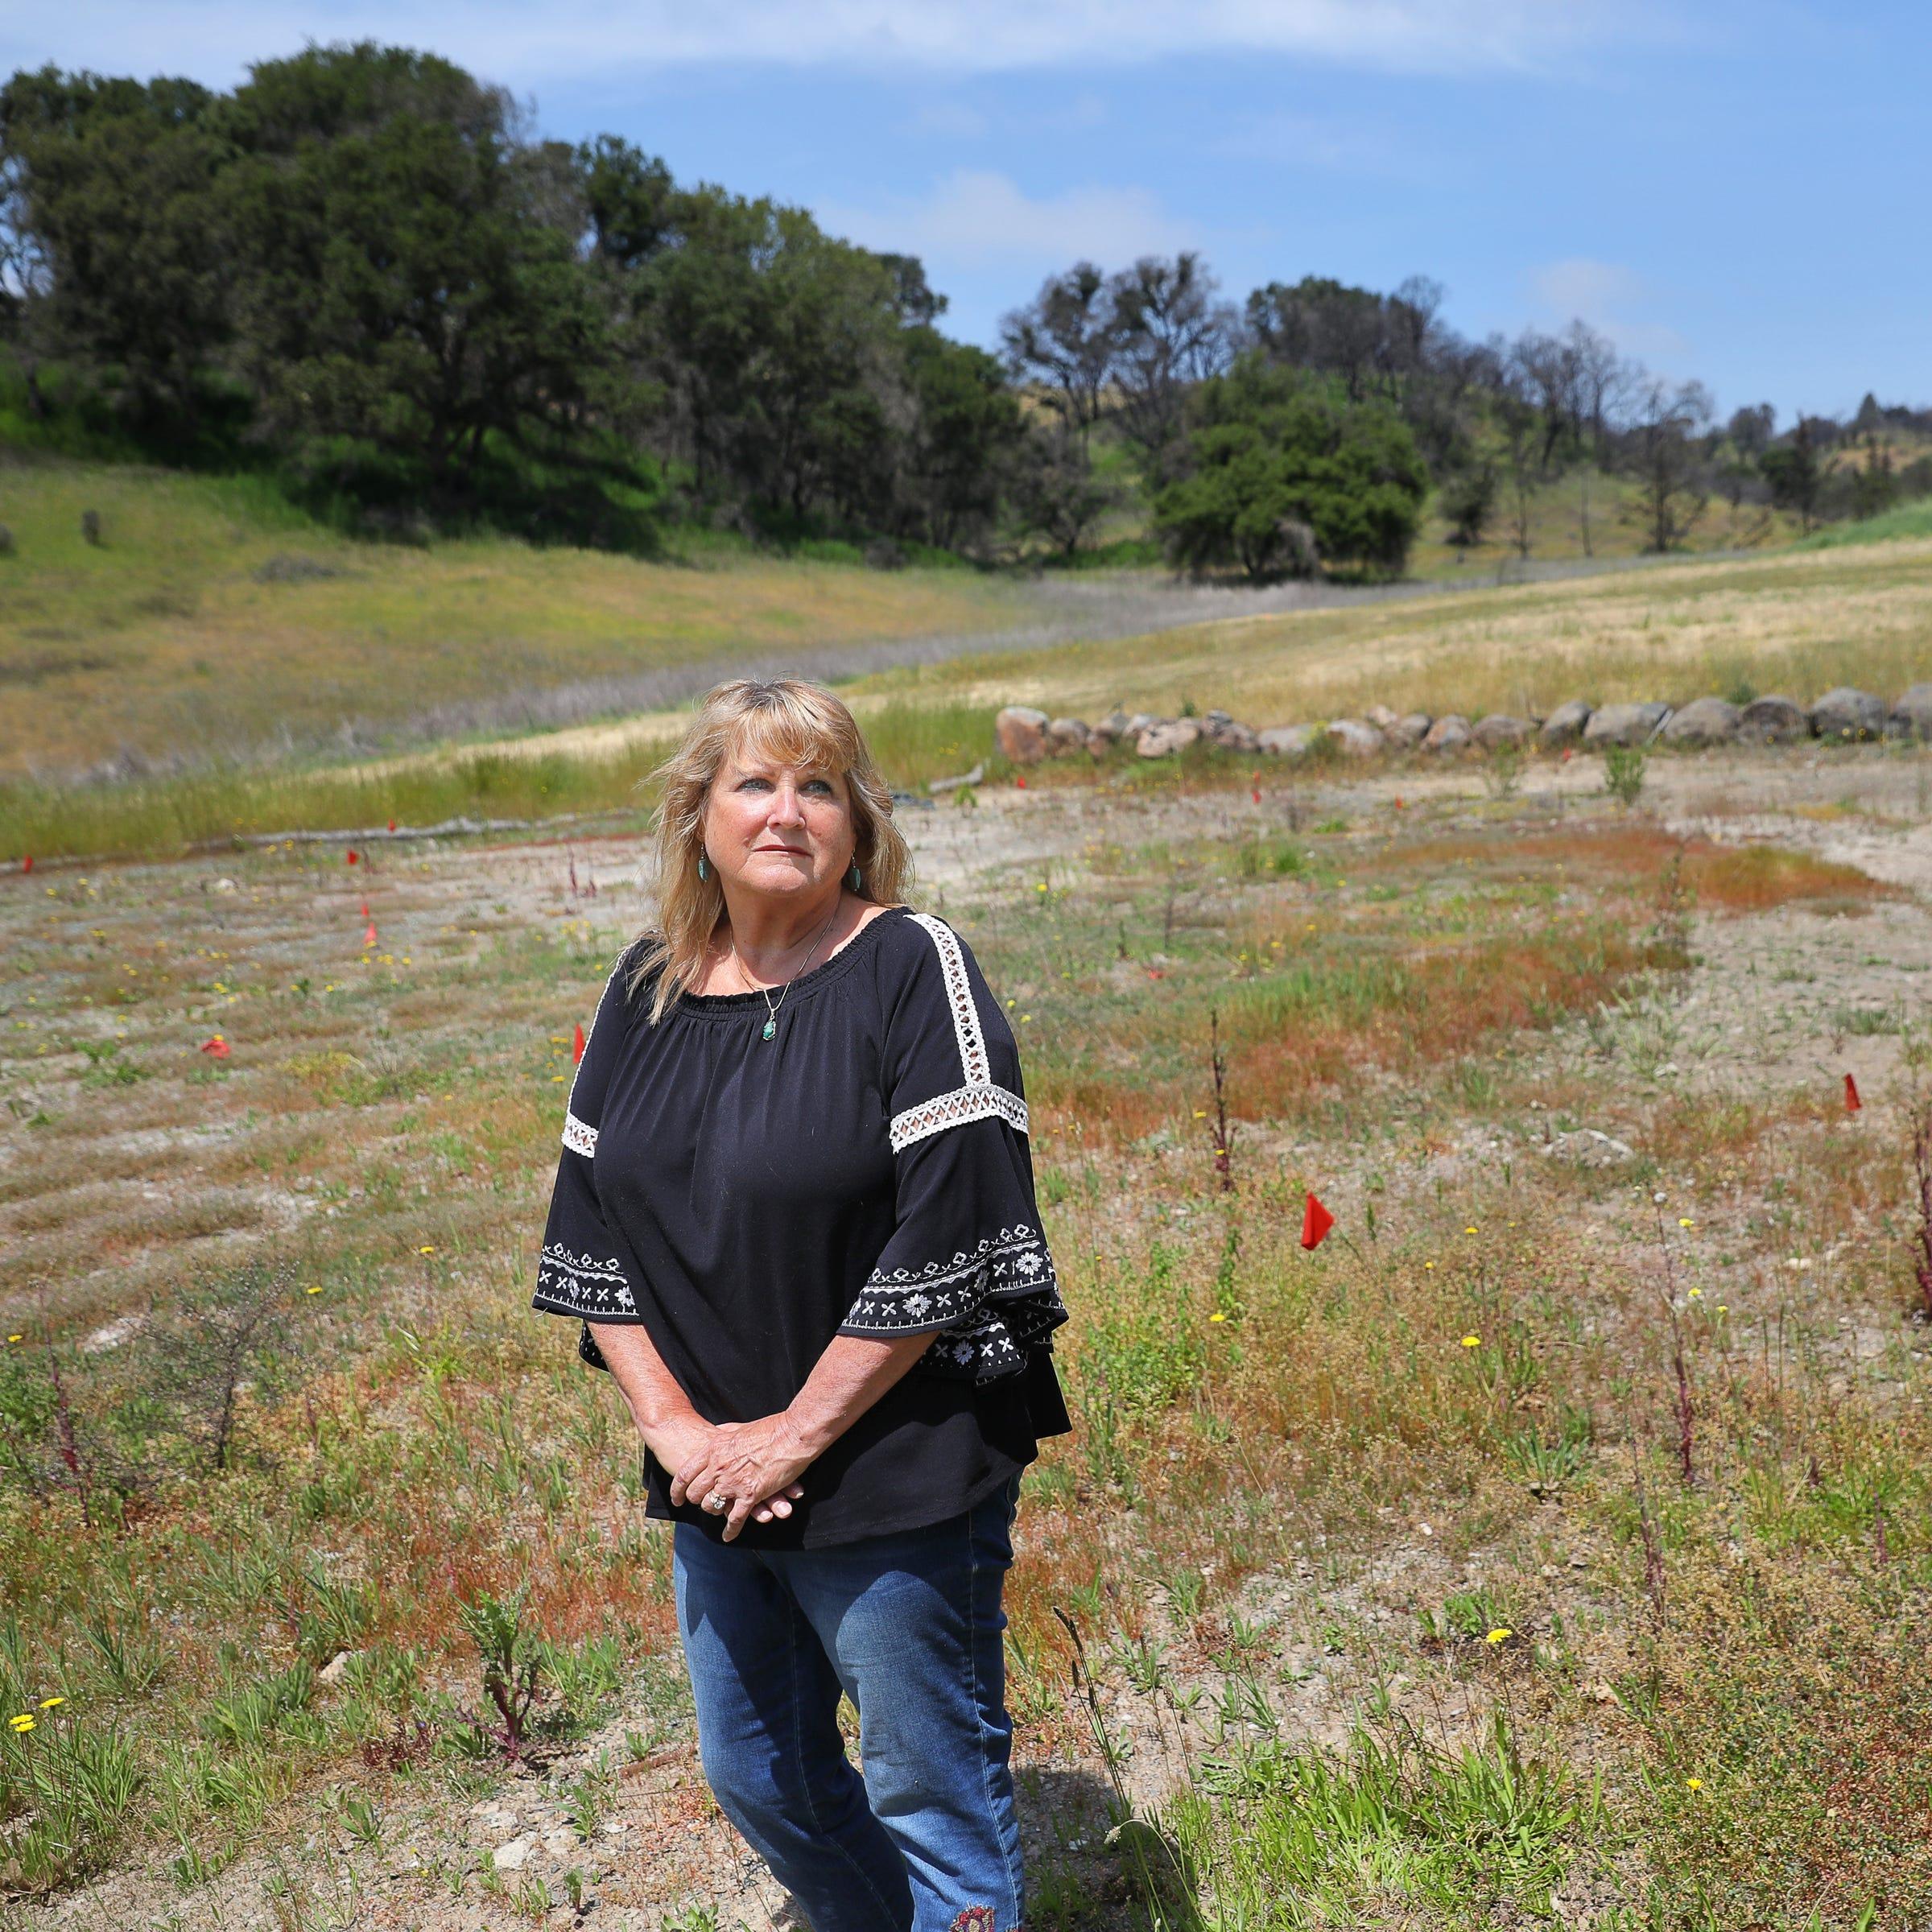 Tubbs fire rebuild: Santa Rosa survivors accuse Tulare contractor of negligence and fraud